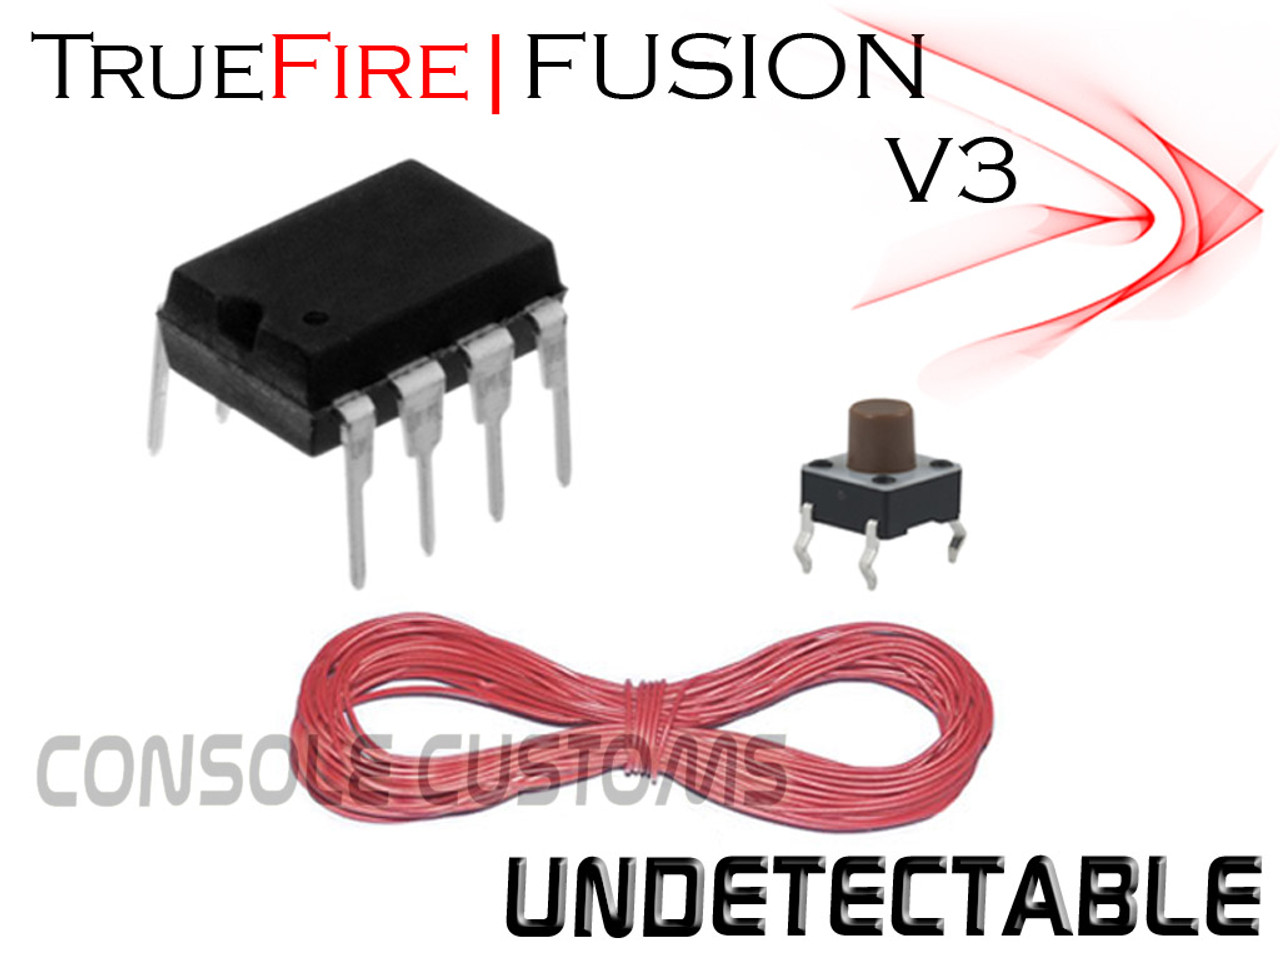 PS3 TrueFire FUSION V3.5 rapid fire Kit